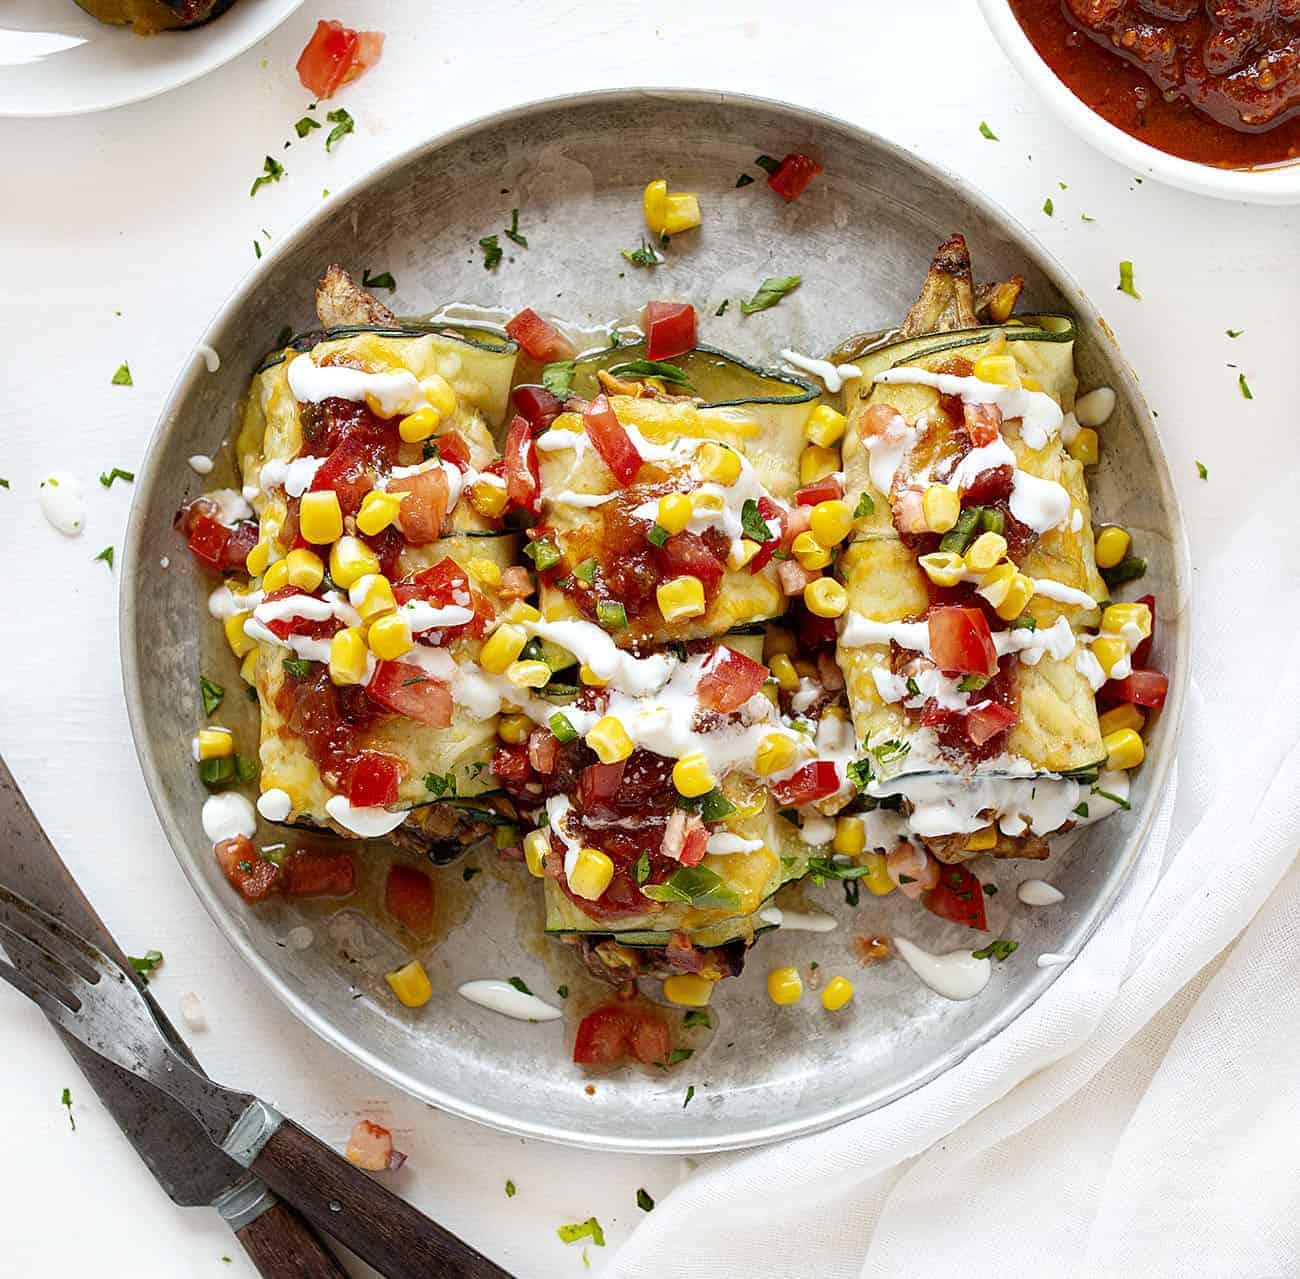 Plate of Southwest Zucchini Roll Ups